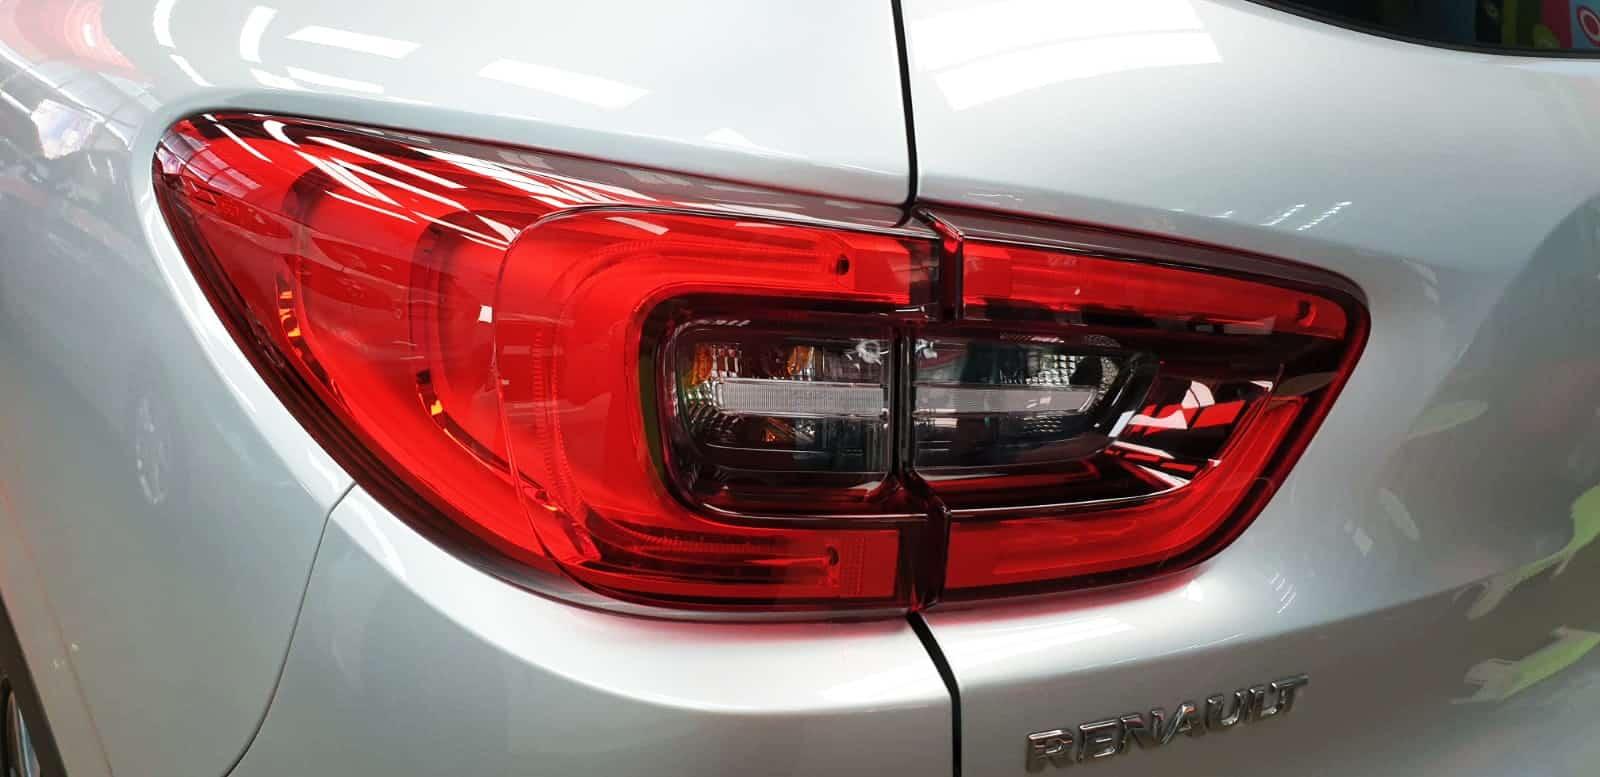 Stunning Renault Kadjar - headlight